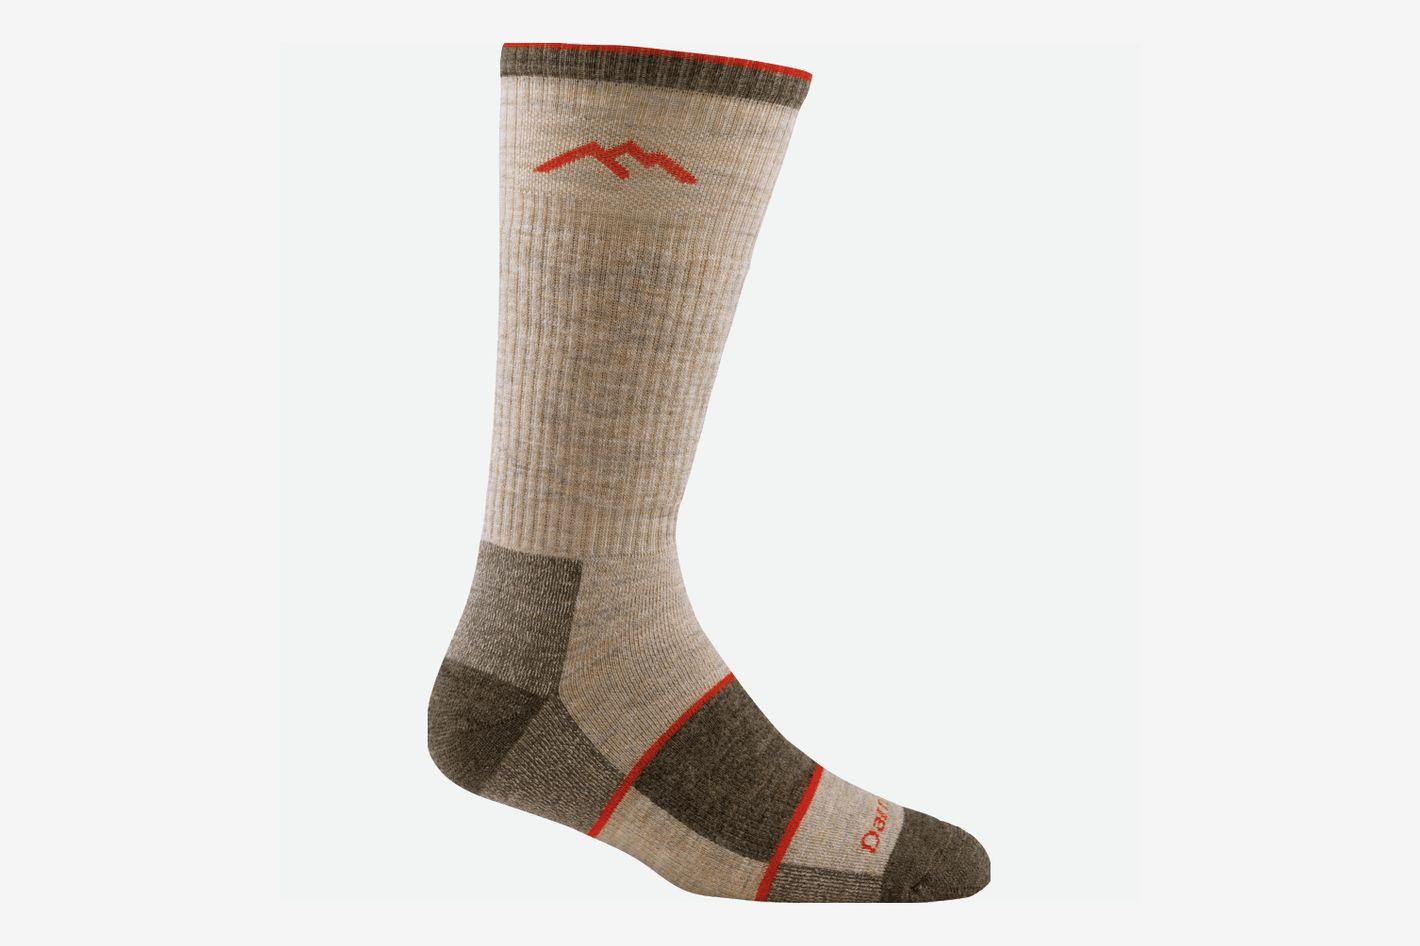 b1499079d4c Darn Tough Merino Wool Boot Sock Full Cushion at Amazon